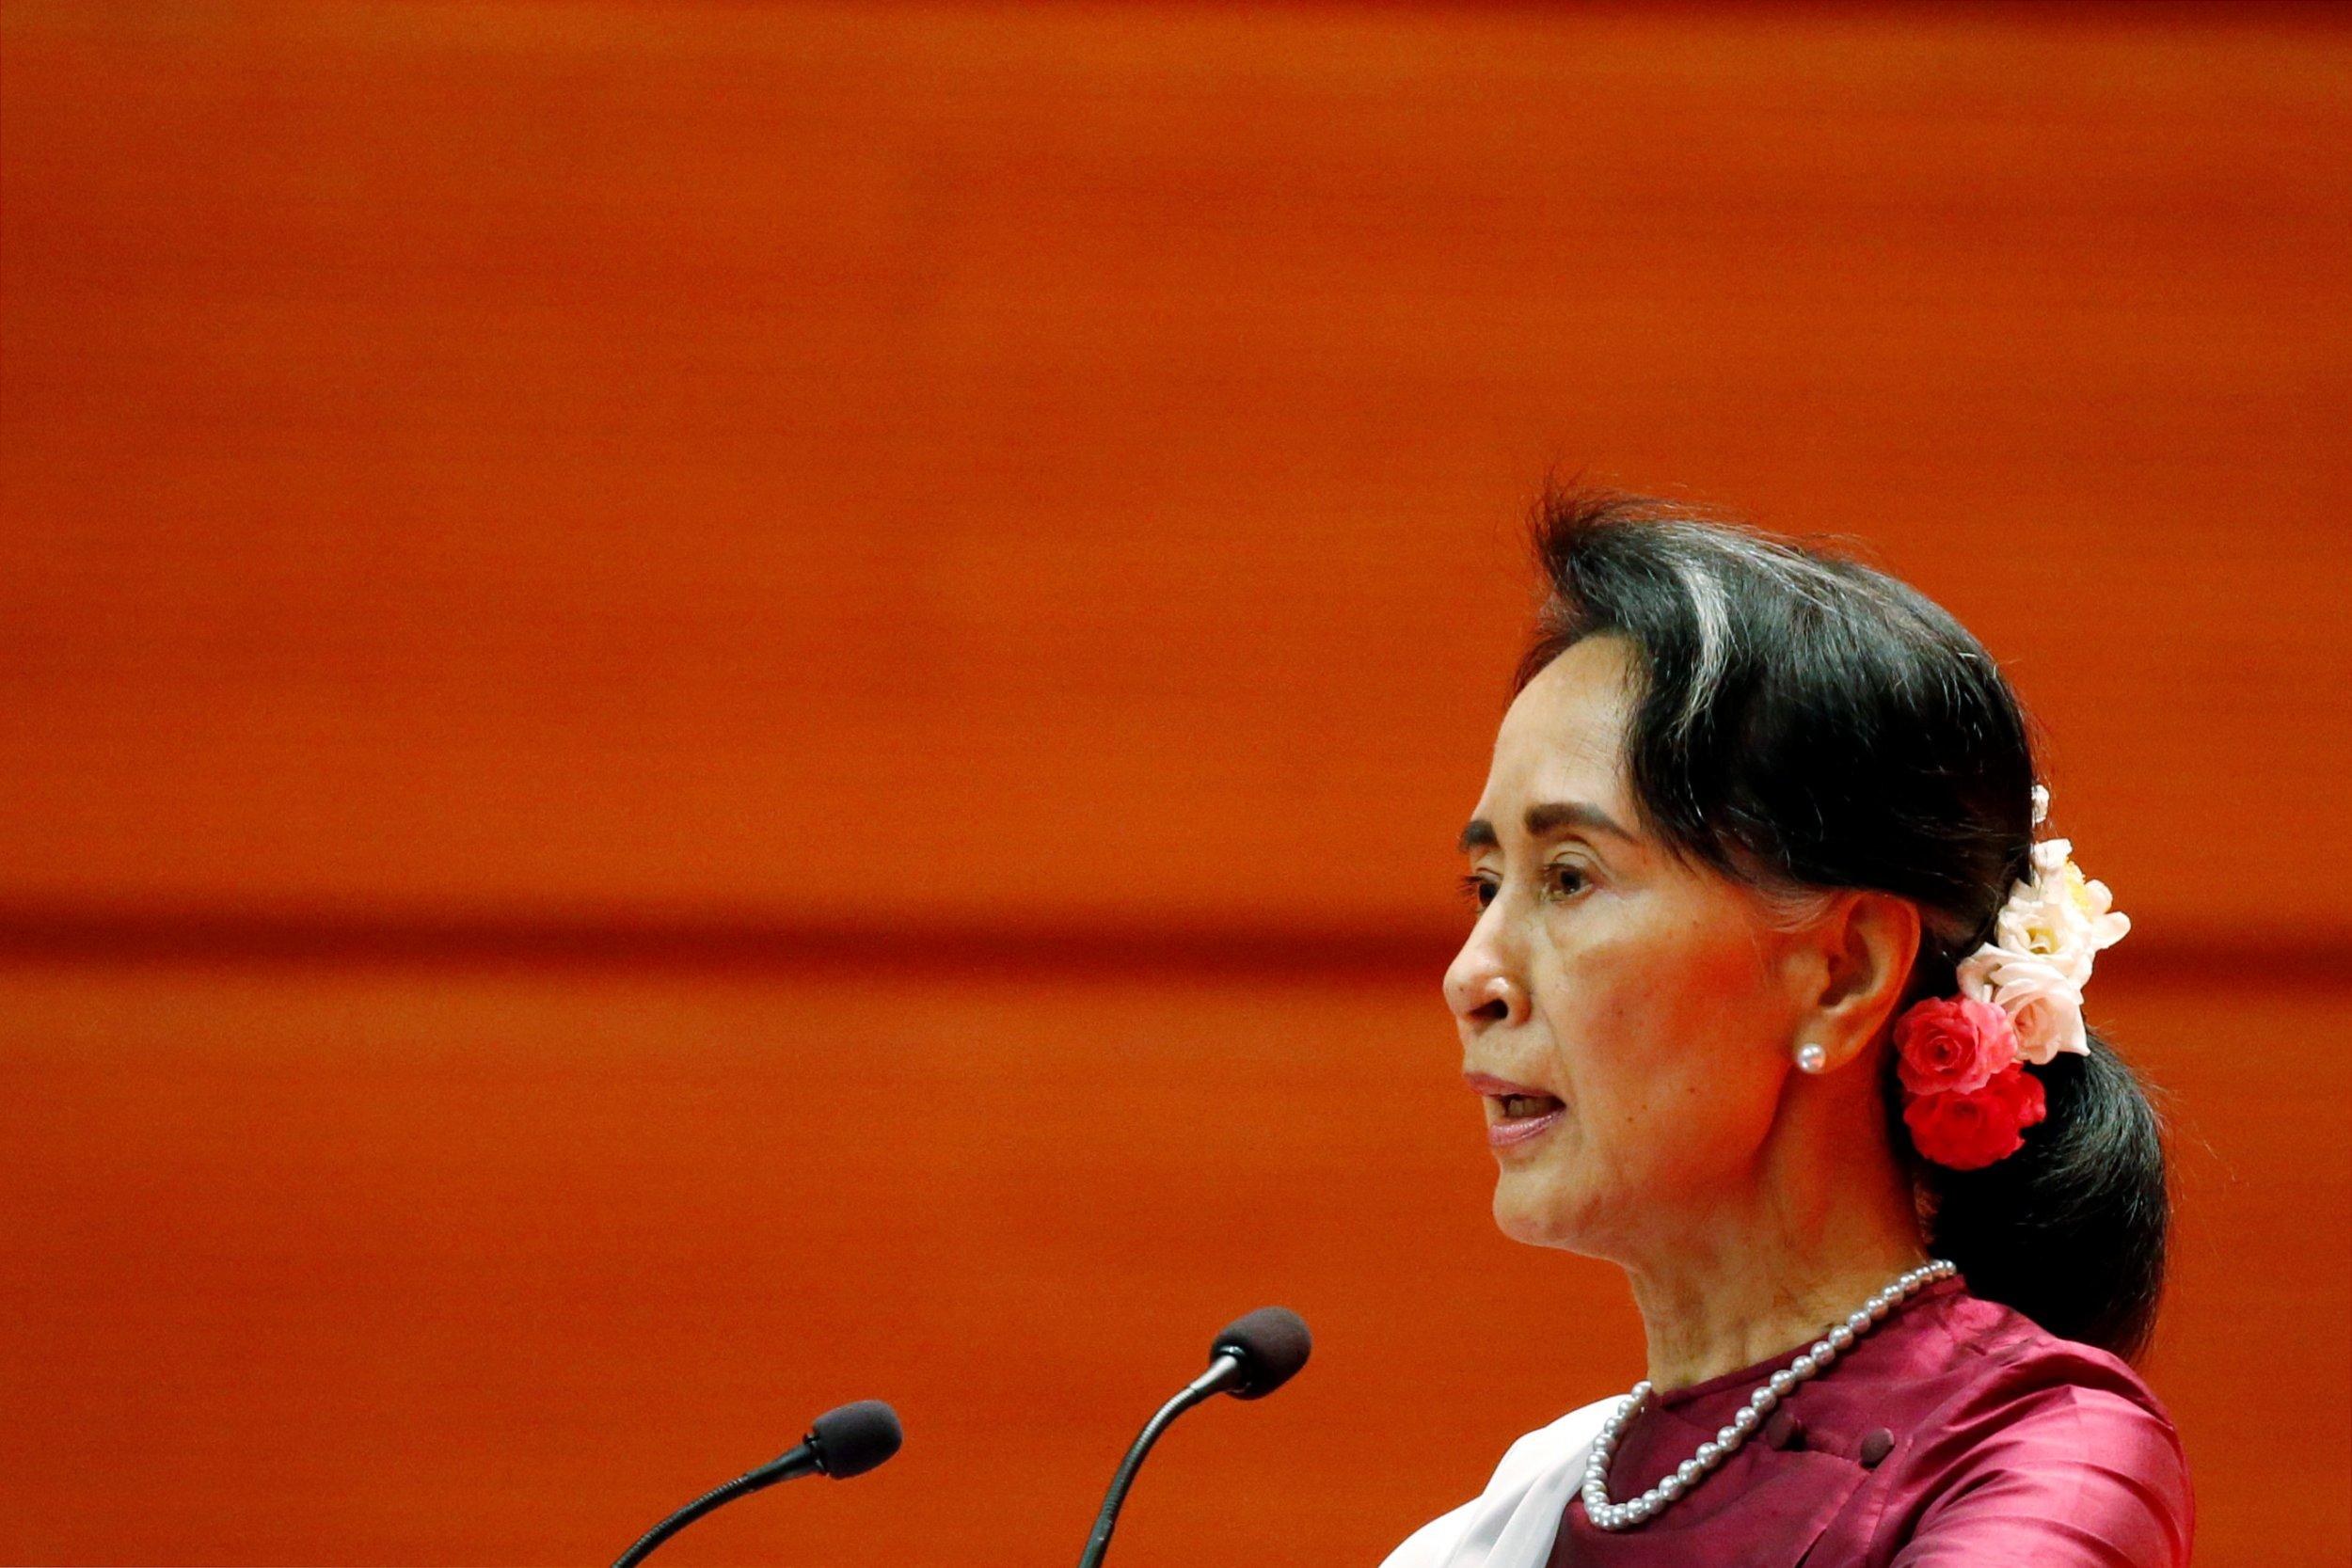 09_19_Aung_San_Suu_Kyi